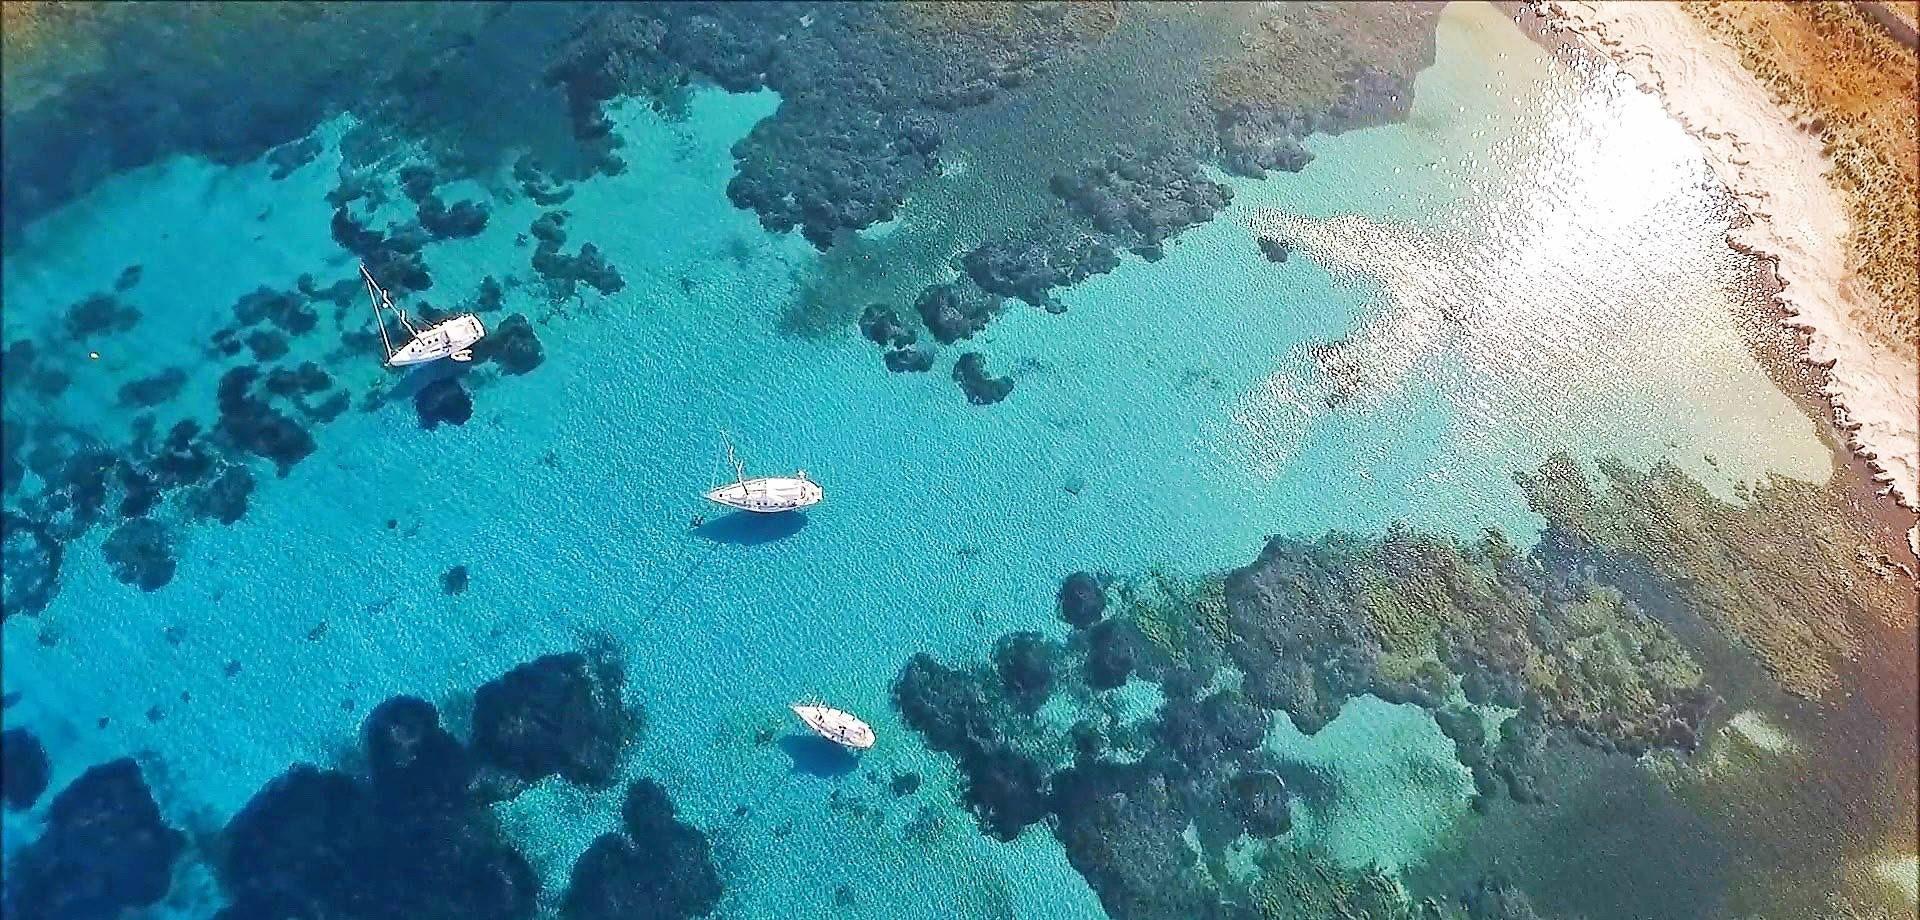 Gita in barca a vela privata all'Asinara